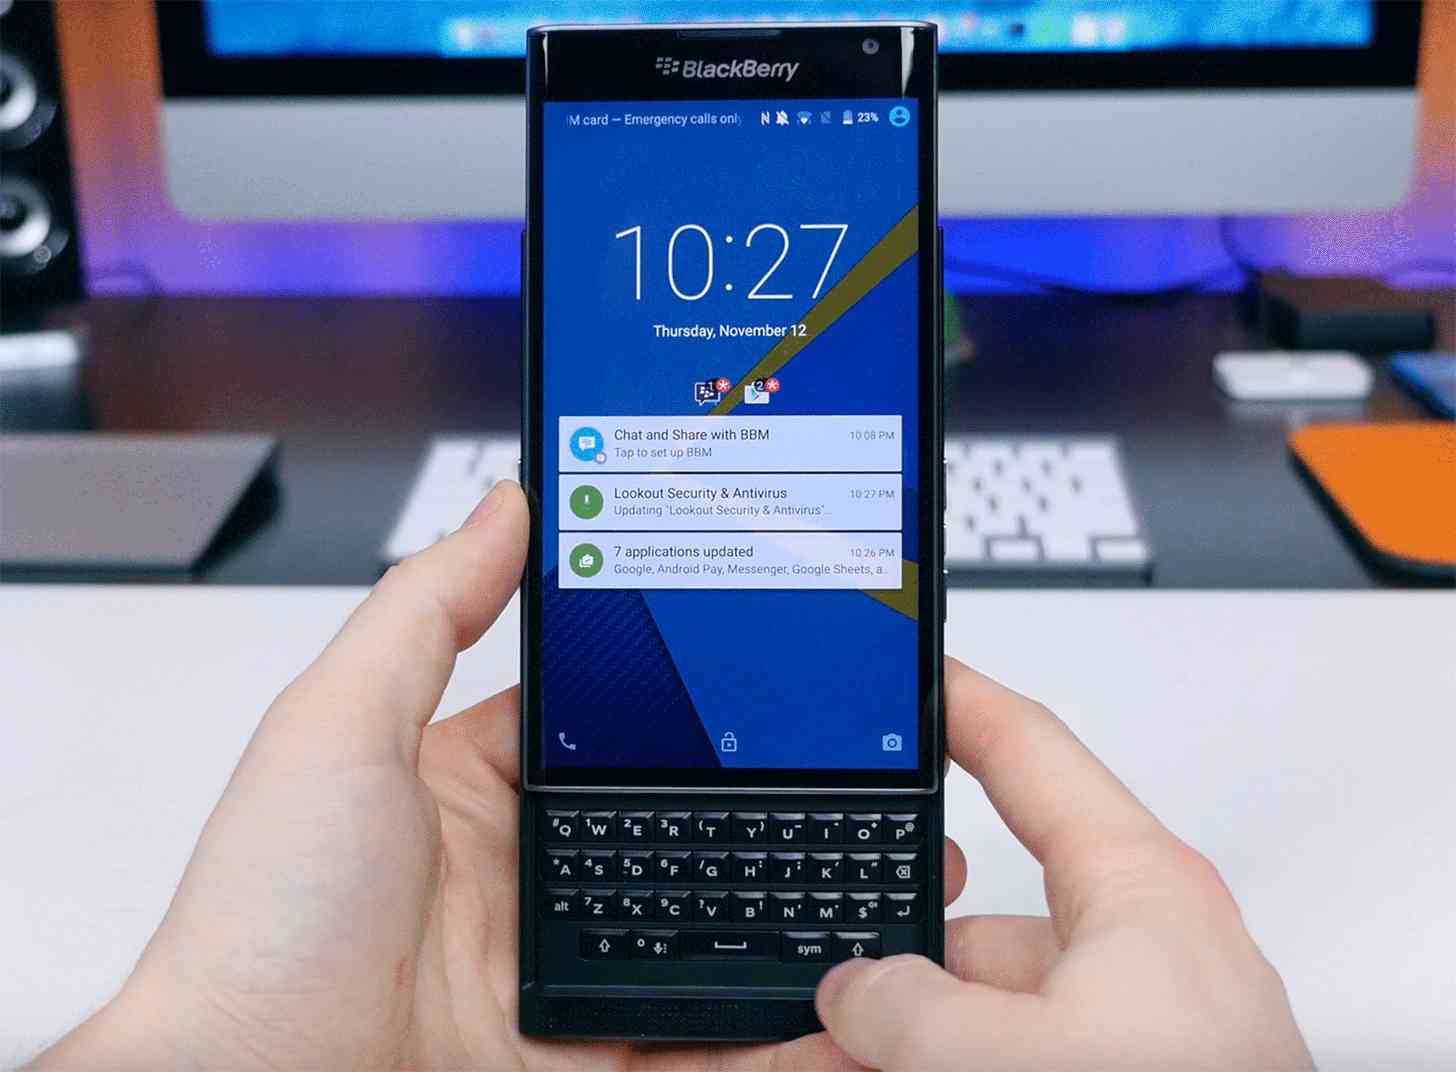 BlackBerry Priv hands-on